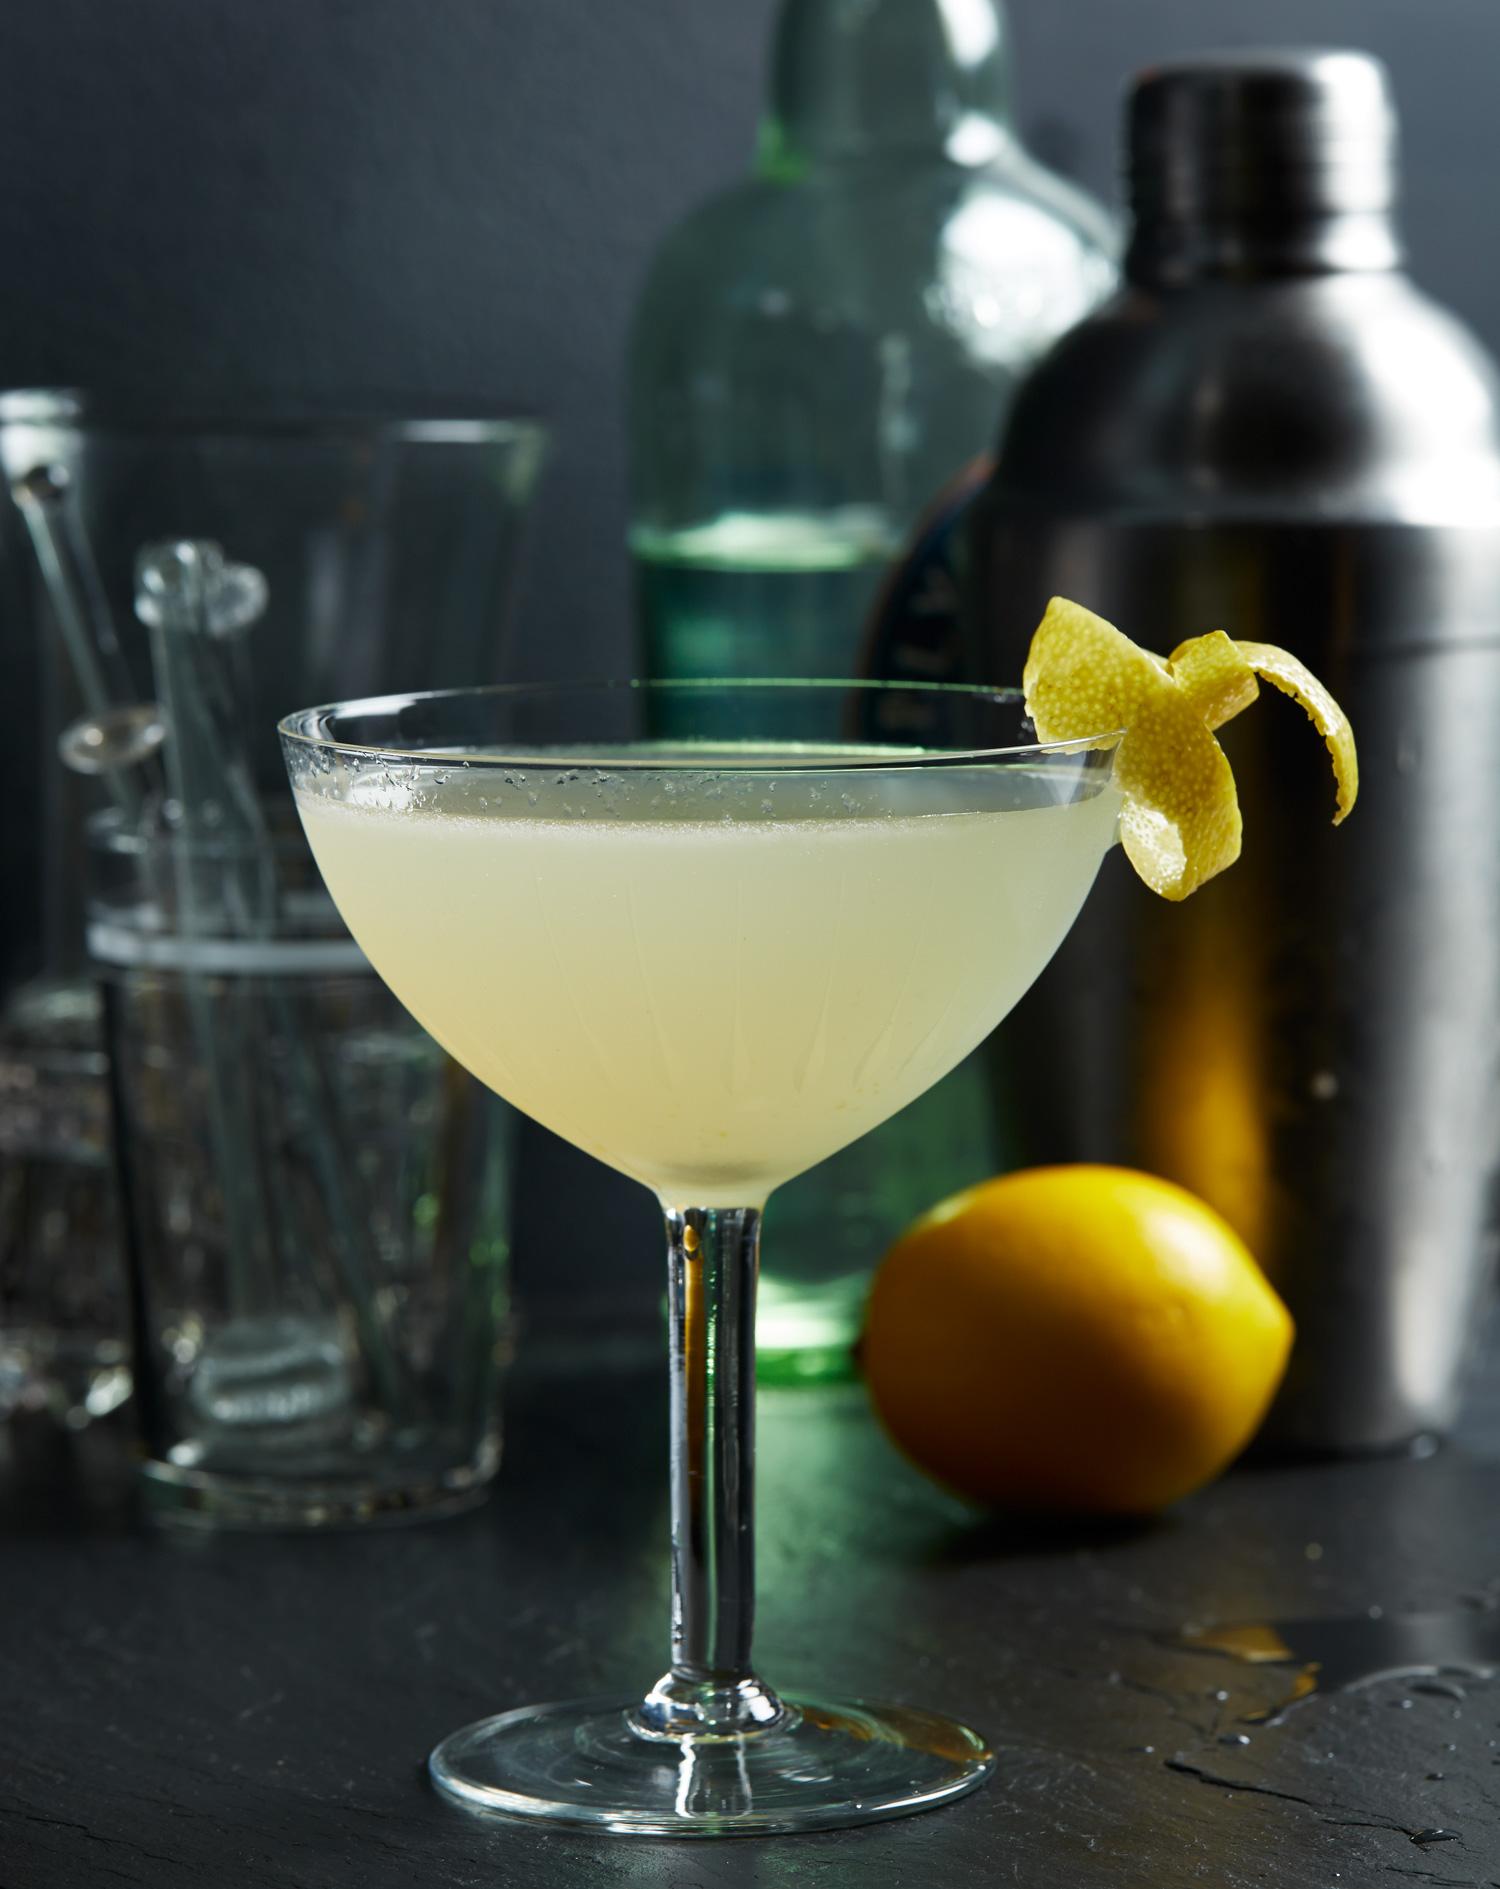 winter cocktail with lemon twist